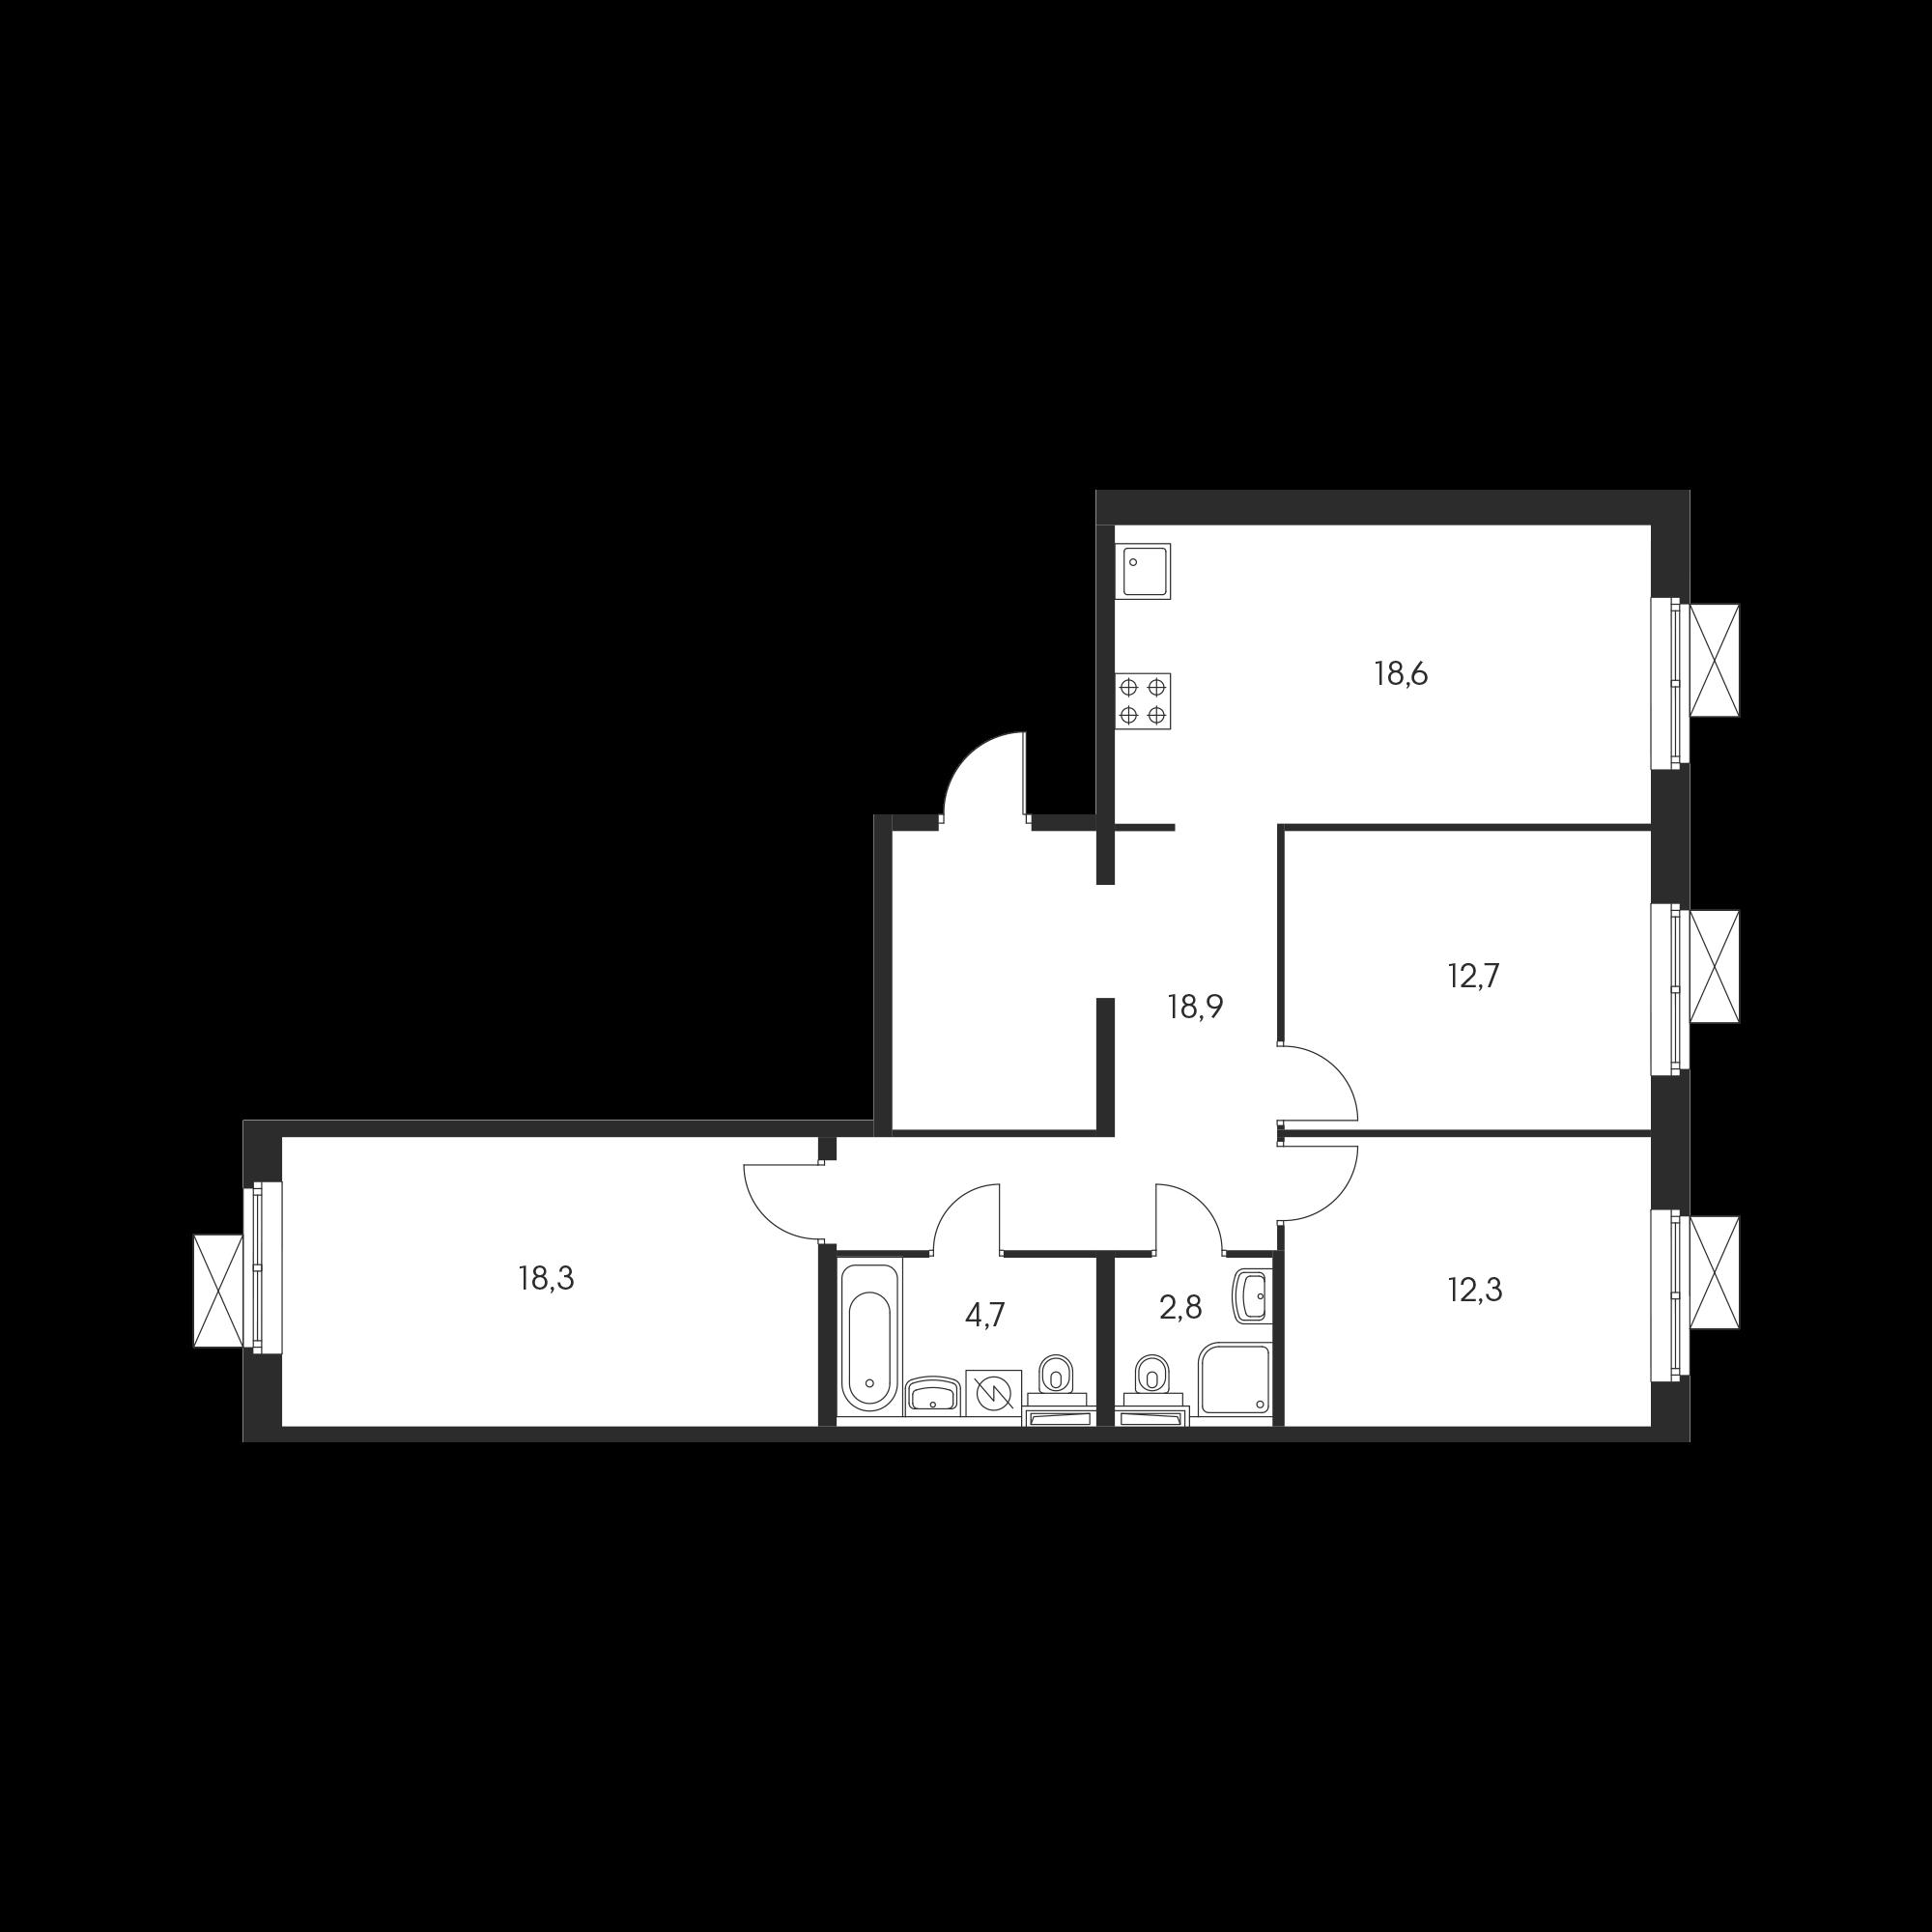 3EL3_9.9-1